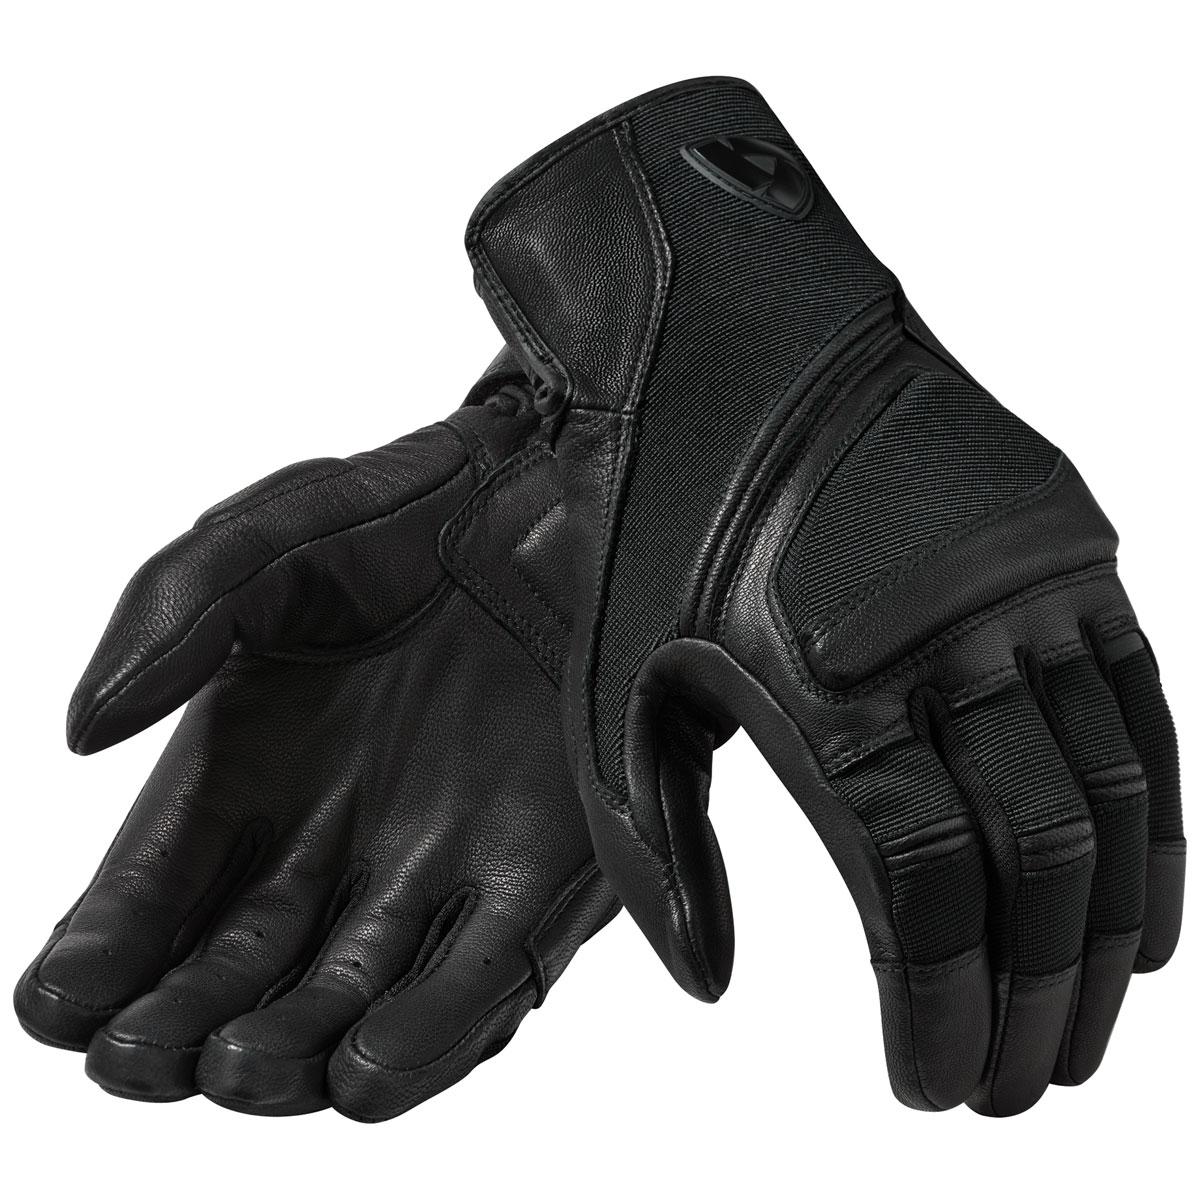 REV'IT! Men's Pandora Black Leather Gloves